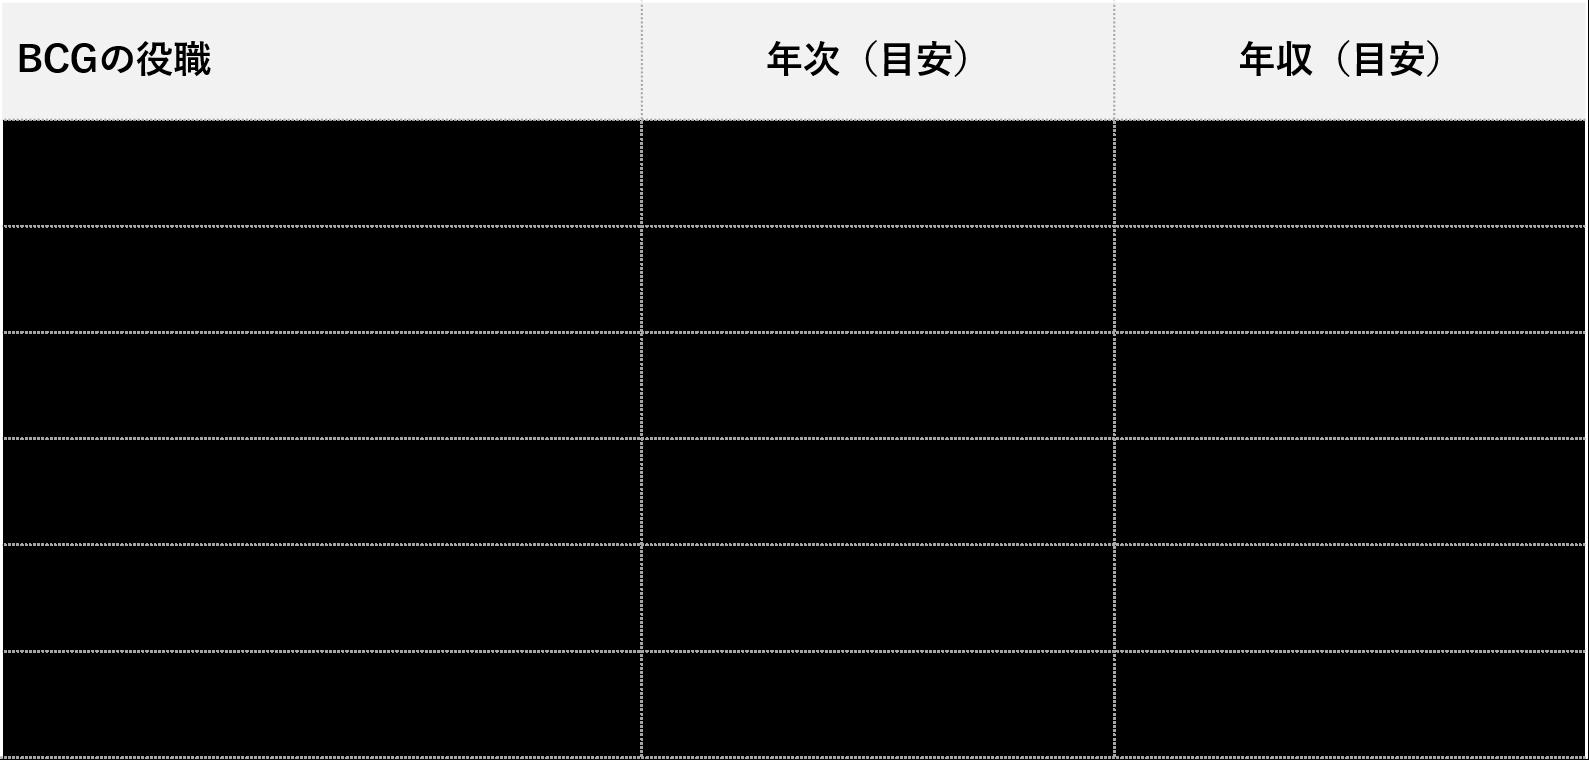 BCG_役職別年収